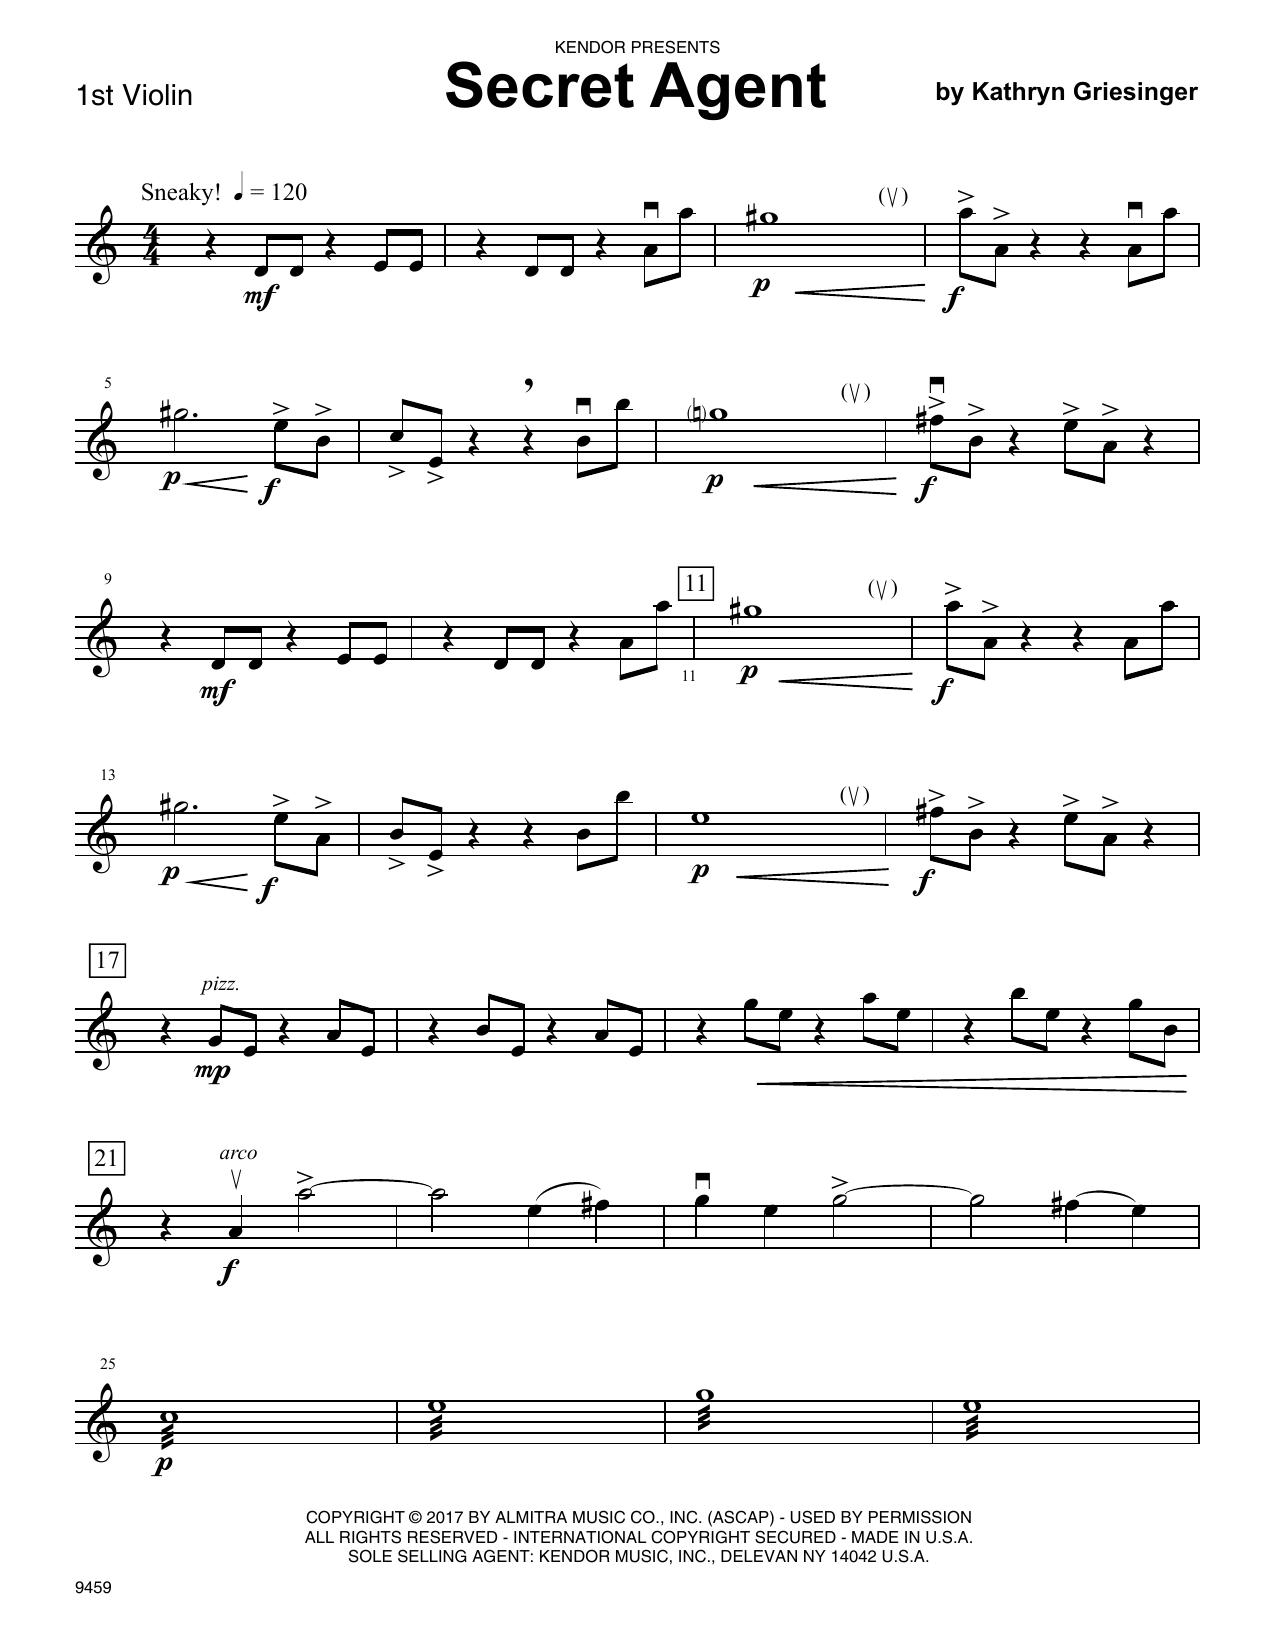 Kathryn Griesinger Secret Agent - 1st Violin sheet music notes and chords. Download Printable PDF.